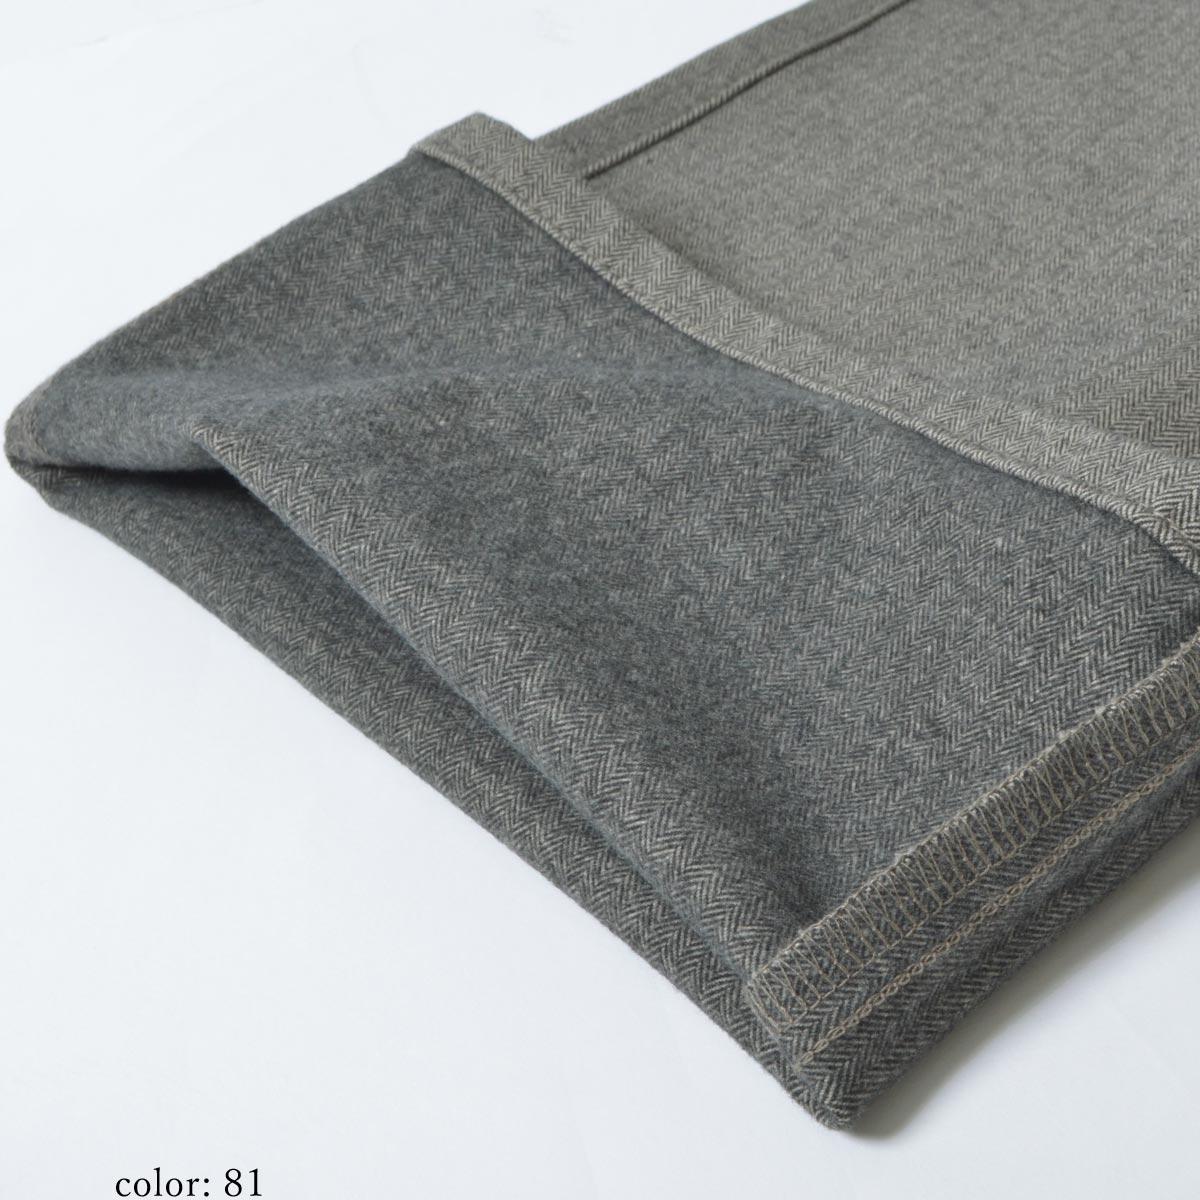 【SALE】Mrs.Jeana ■暖■ 裏起毛ヘリンボン柄スレンダー MJ4163